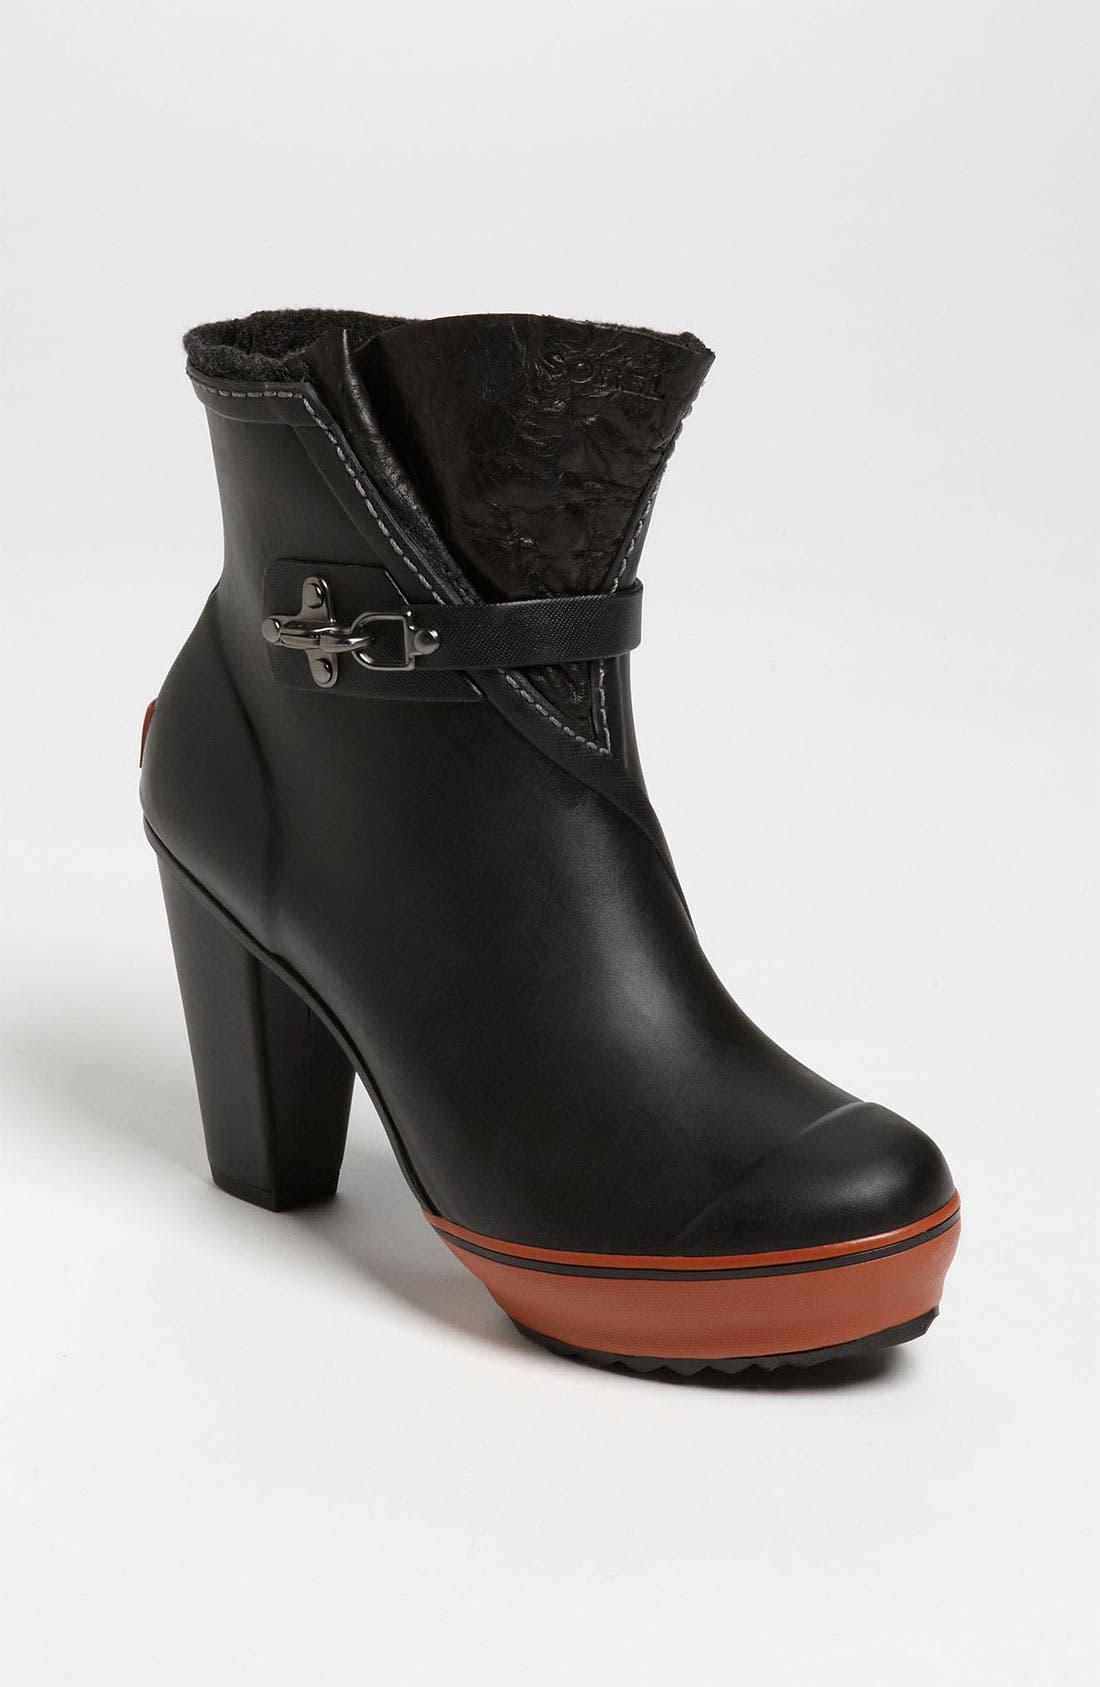 Main Image - SOREL 'Medina' Rain Boot (Women)